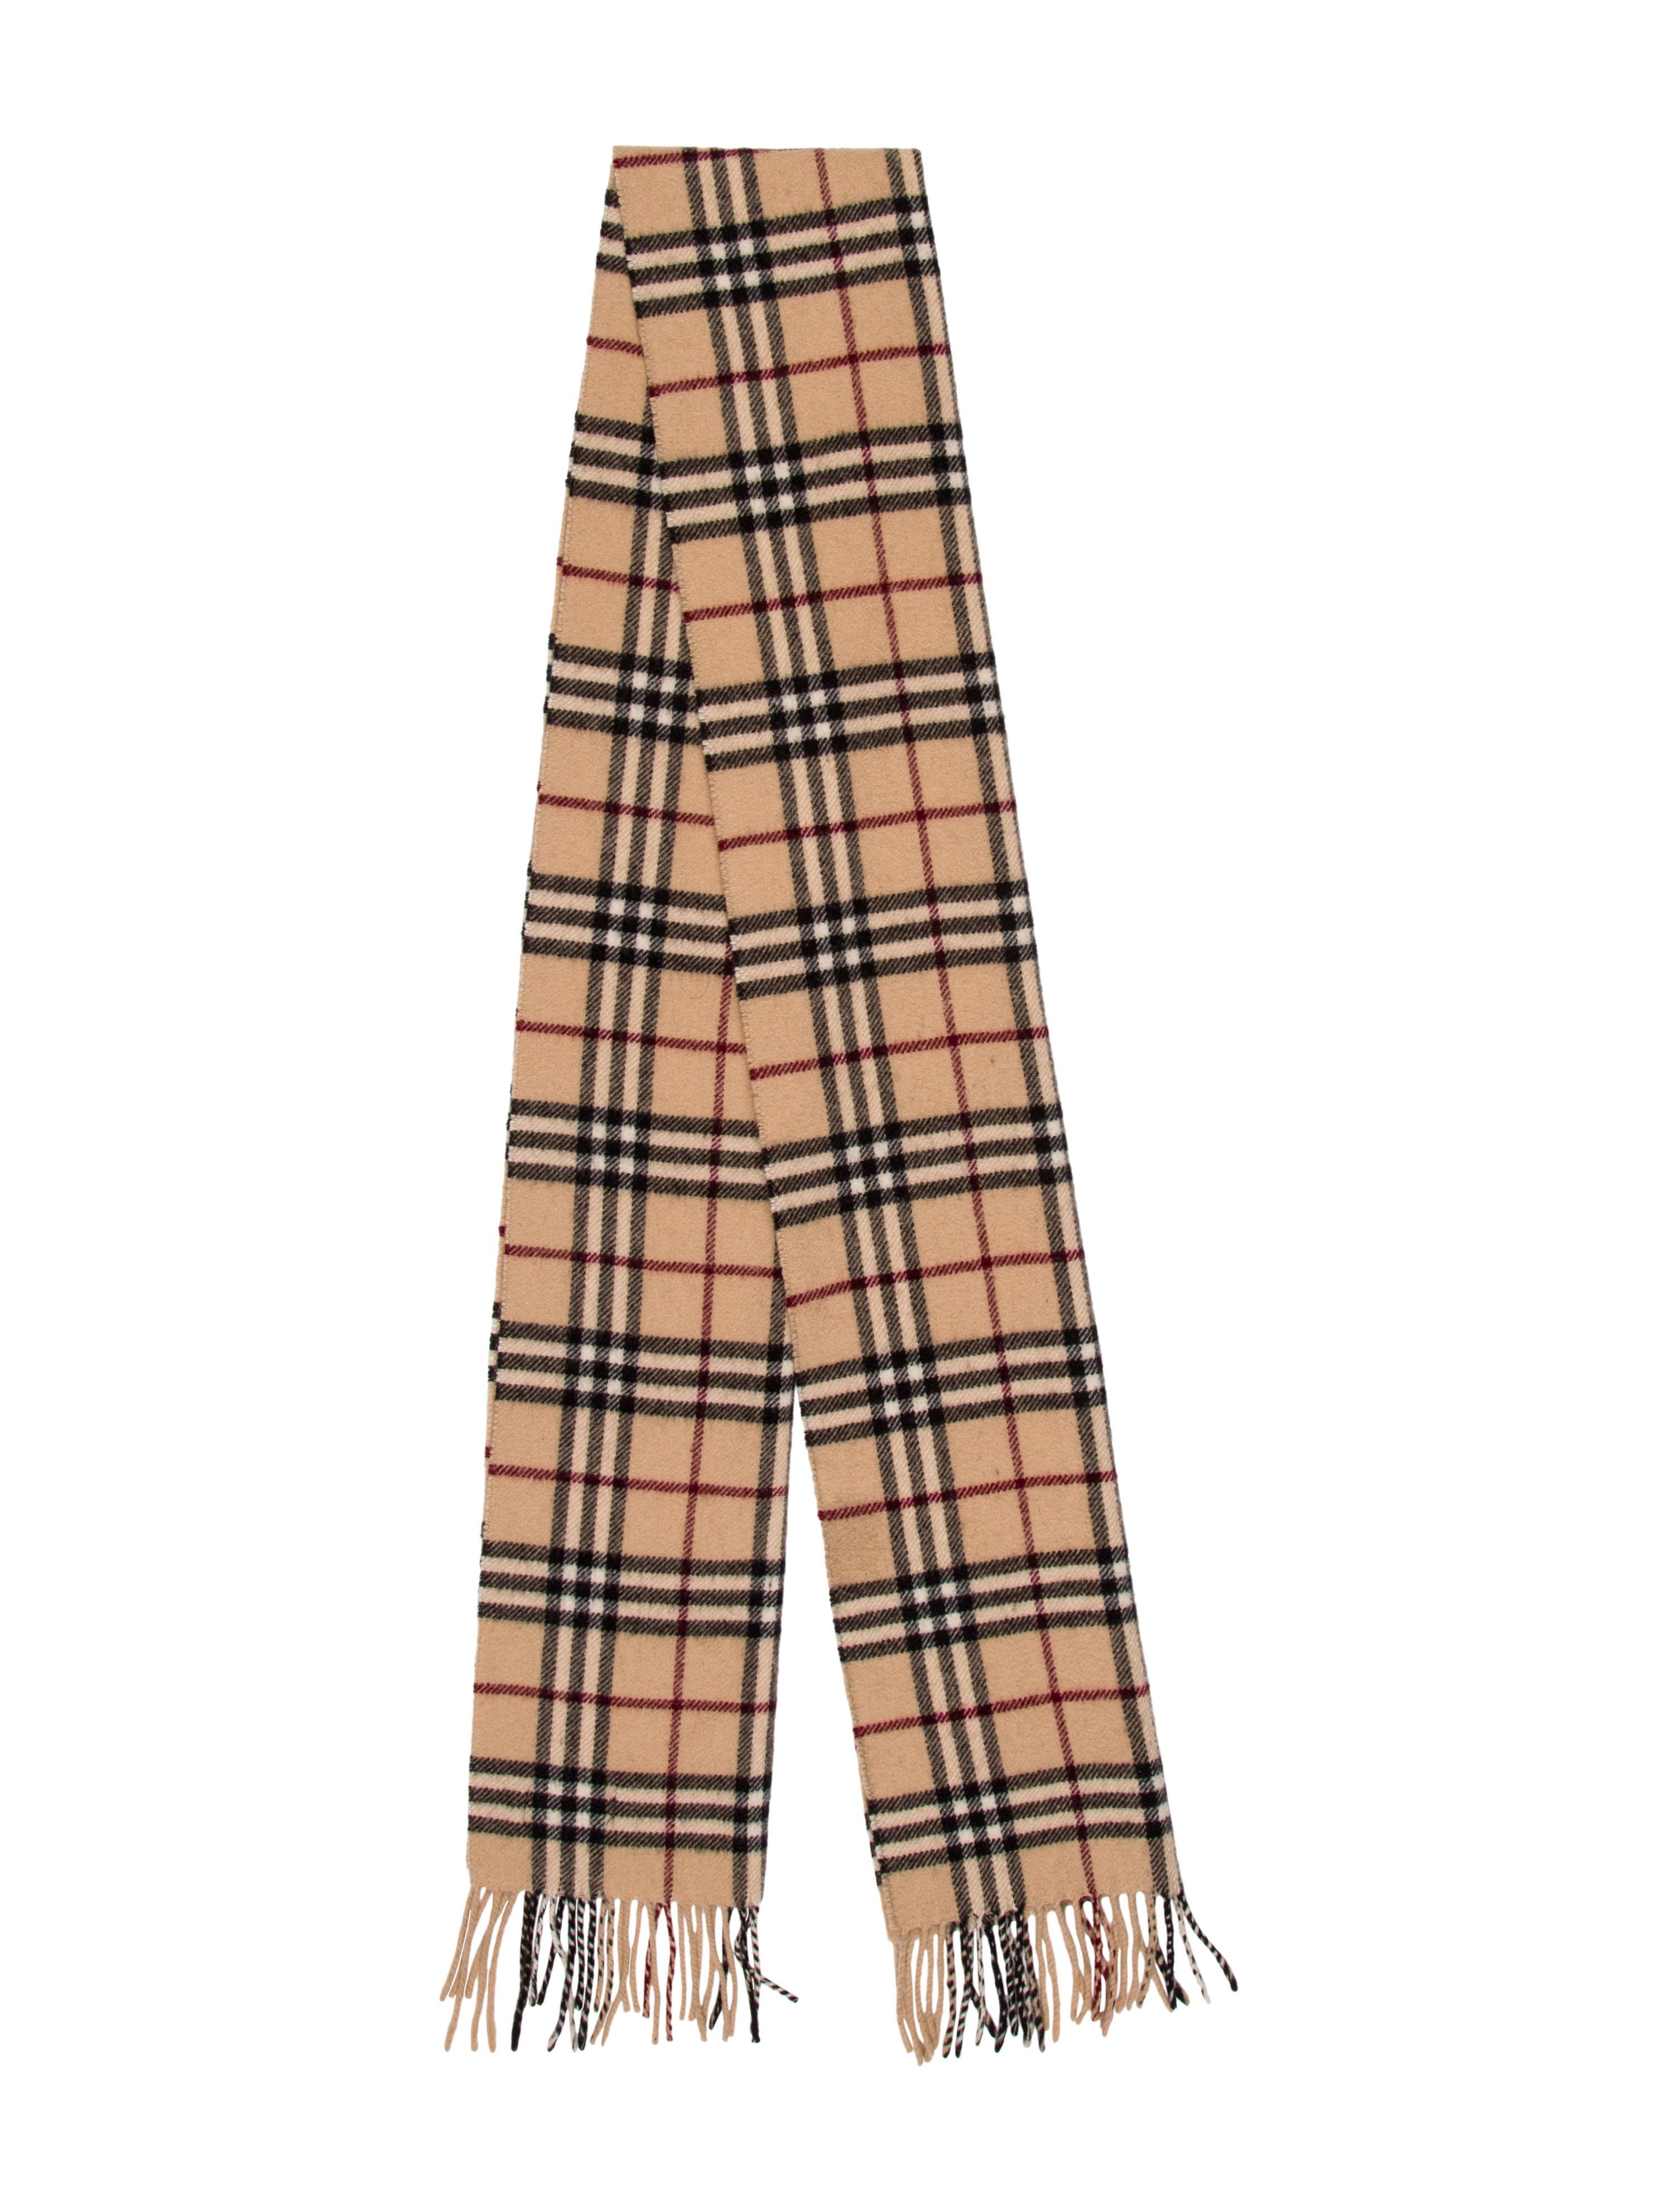 Wool Nova Check Scarf by Burberry